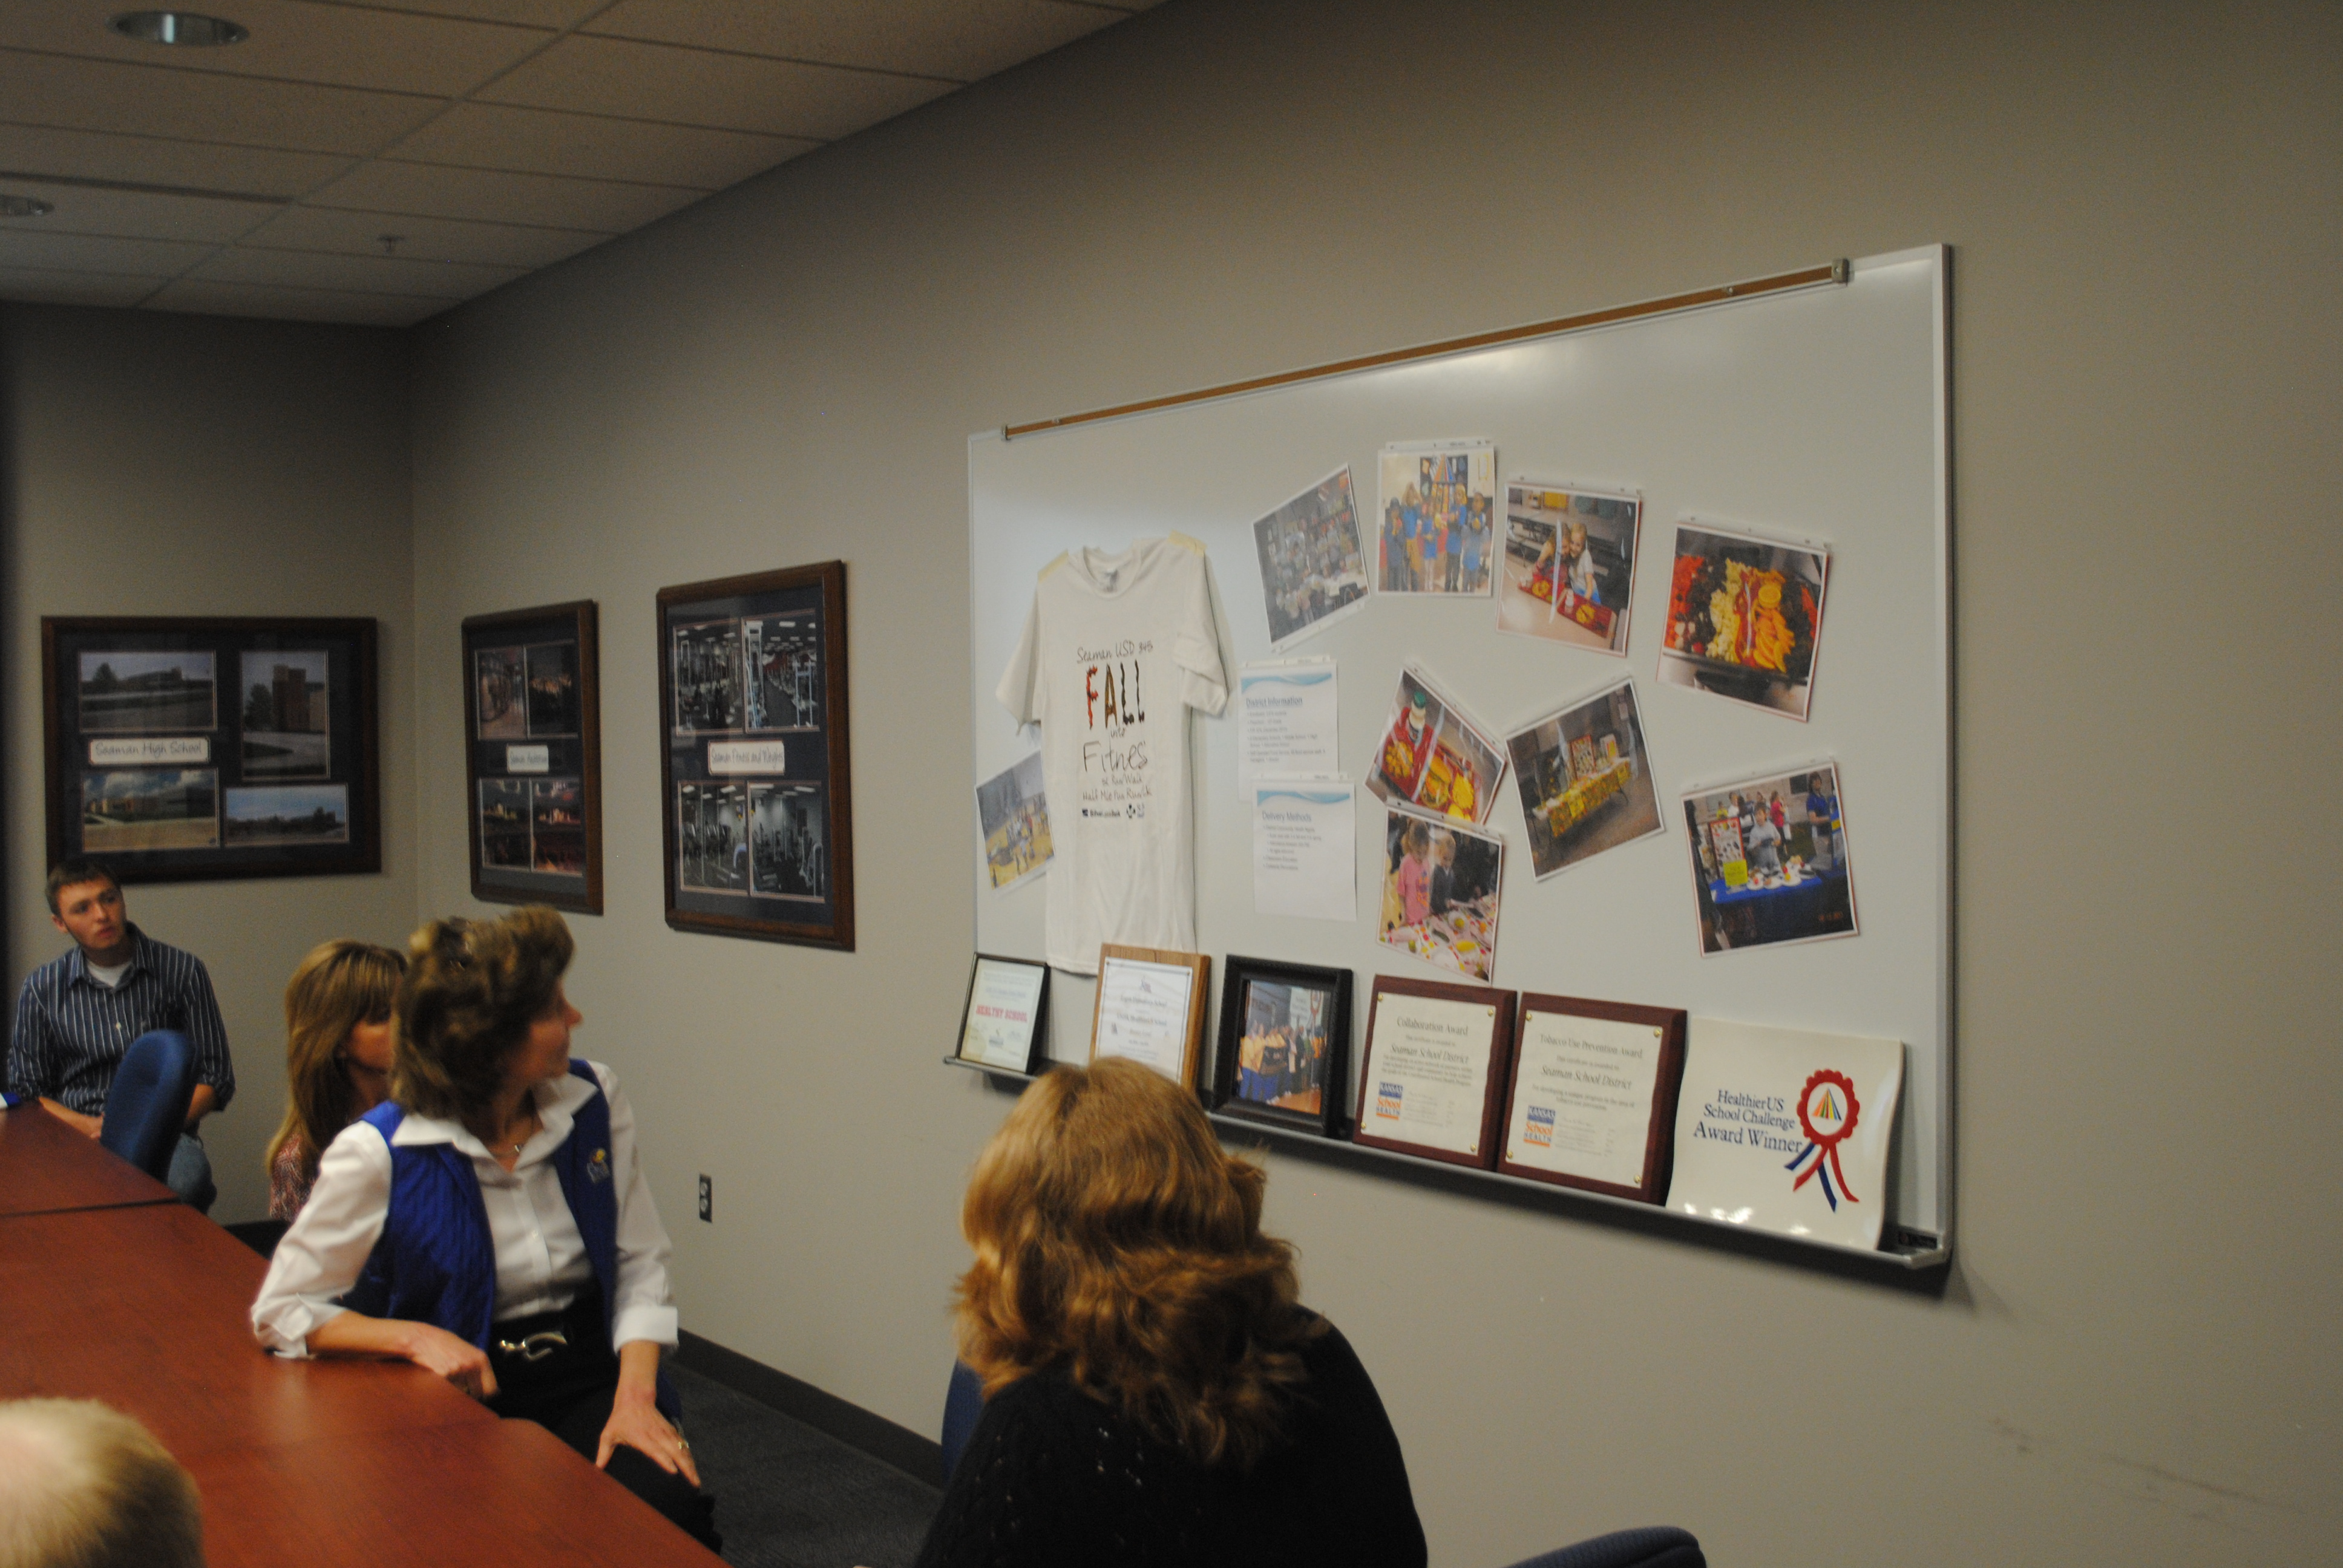 Congresswoman visits Seaman to discuss health program. (Photo by Dalton Hiegert)